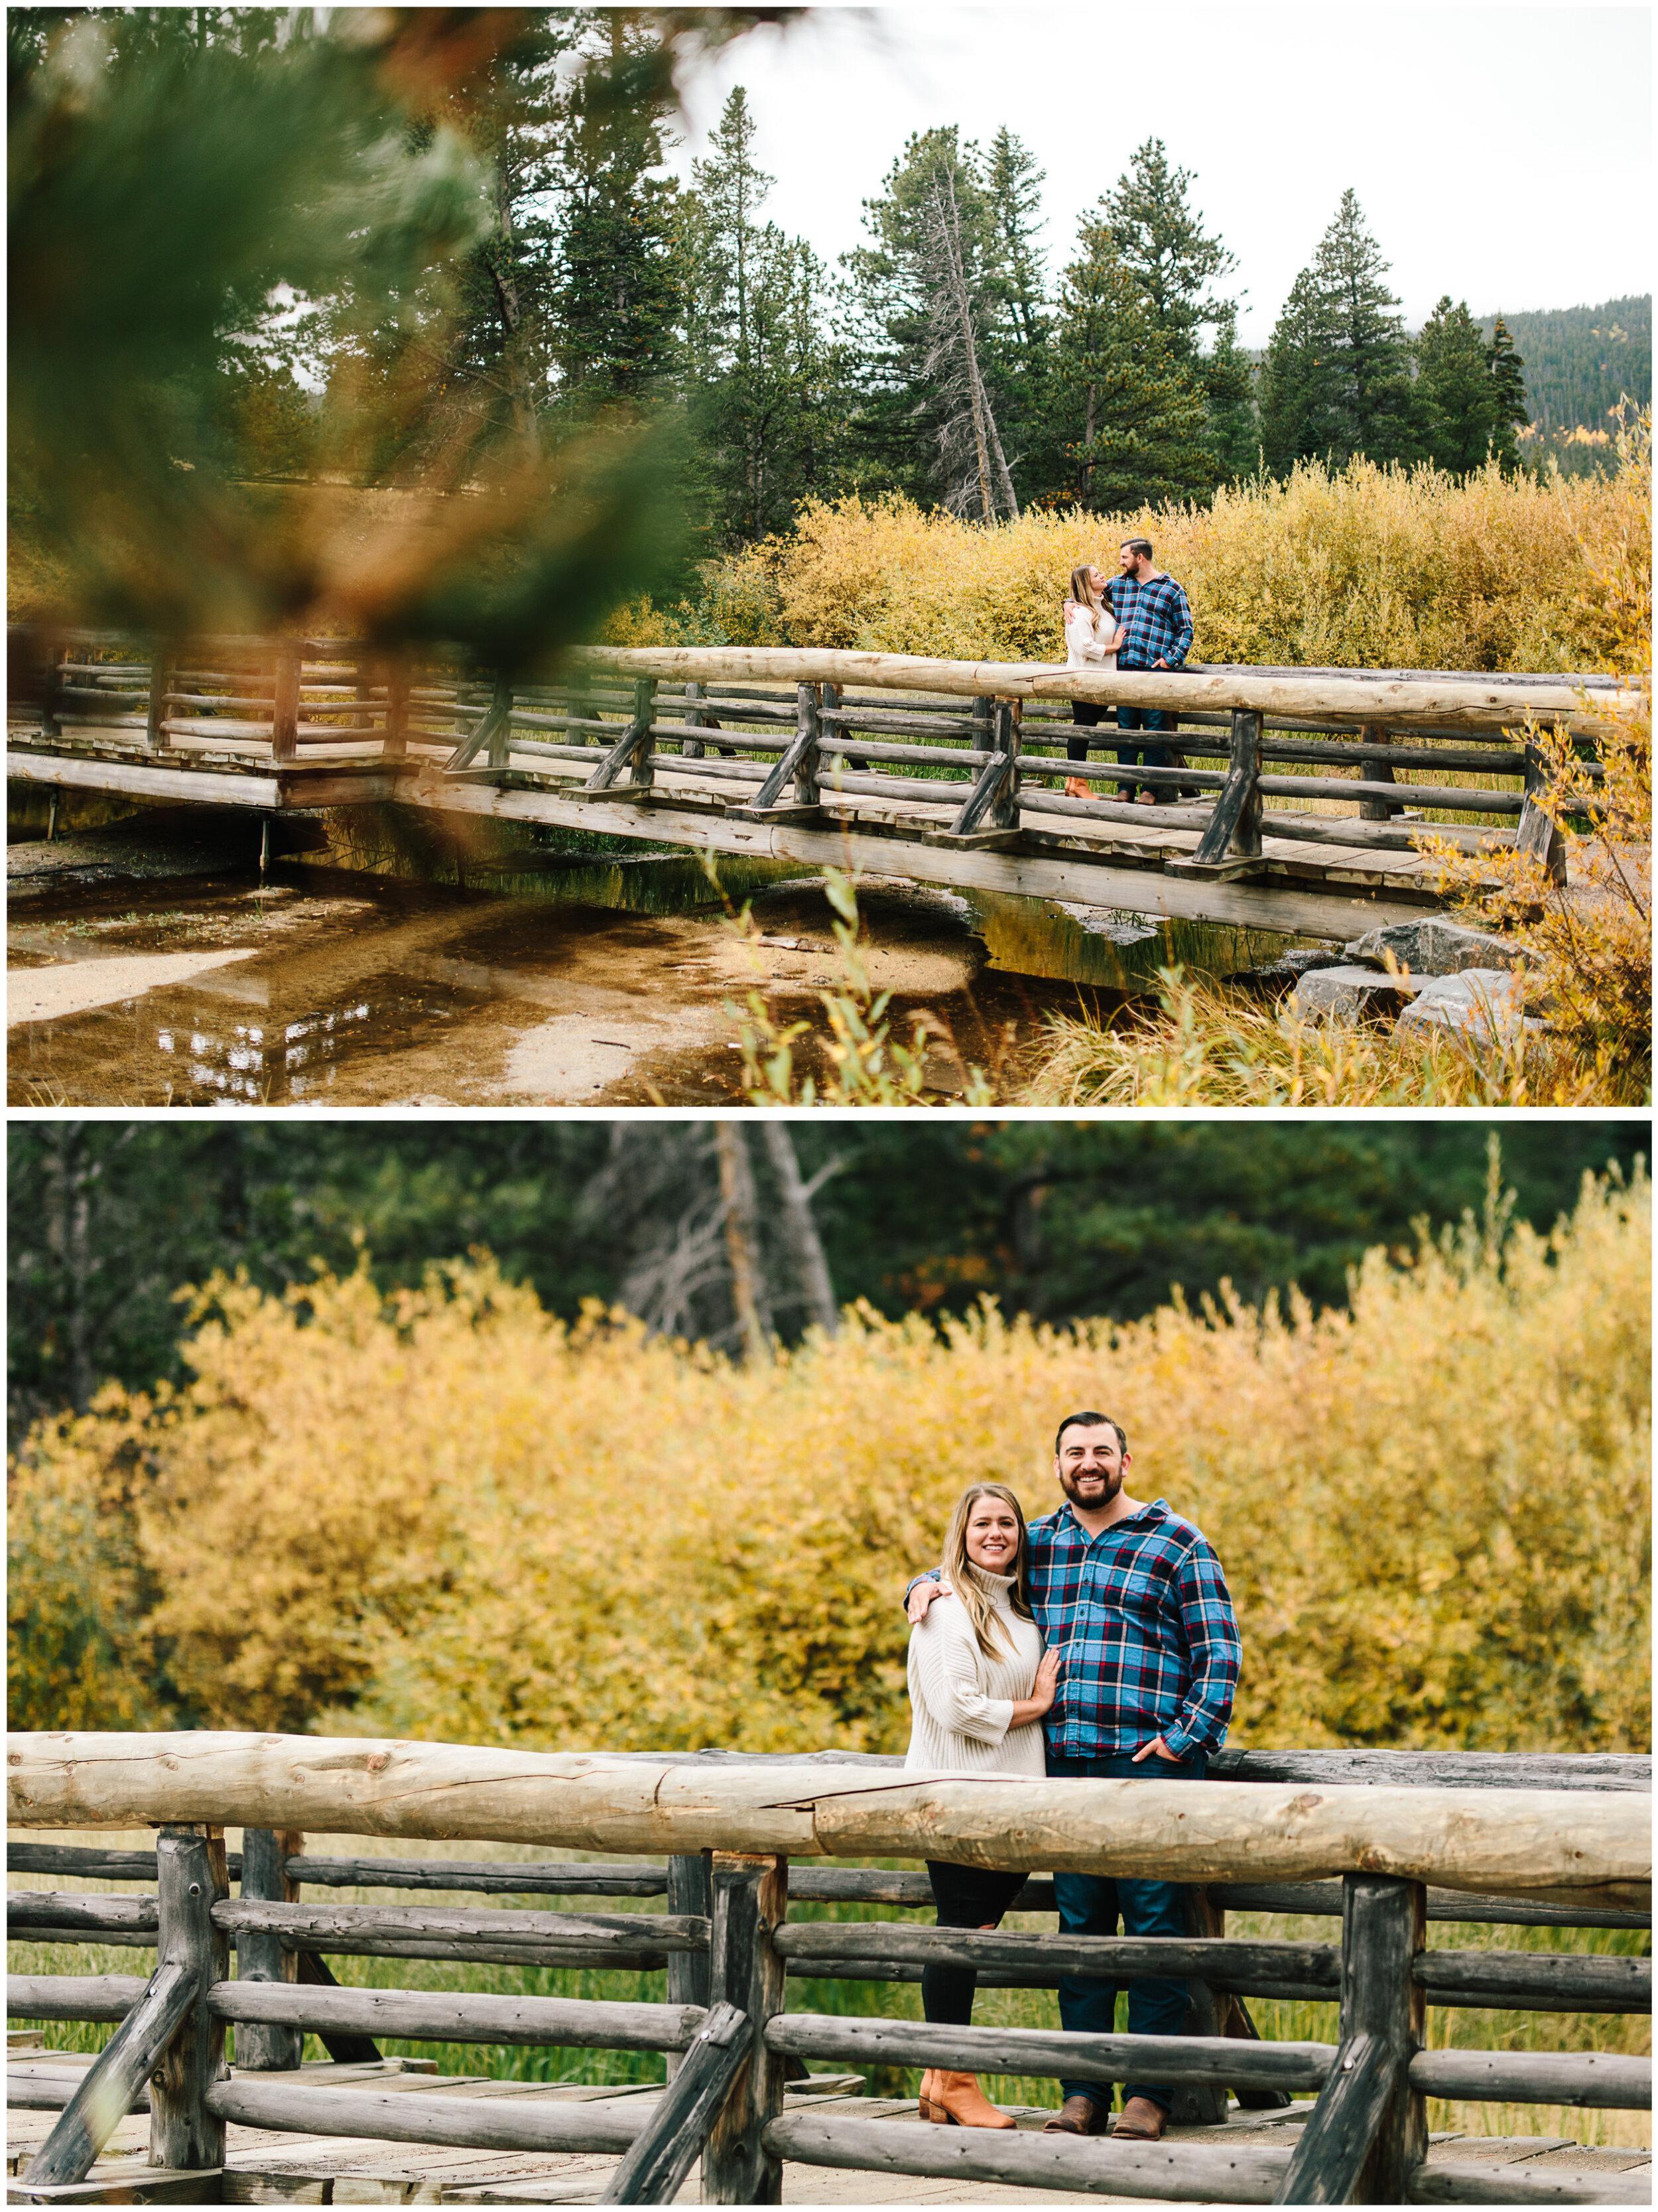 rocky_mountain_national_park_fall_engagement_16.jpg